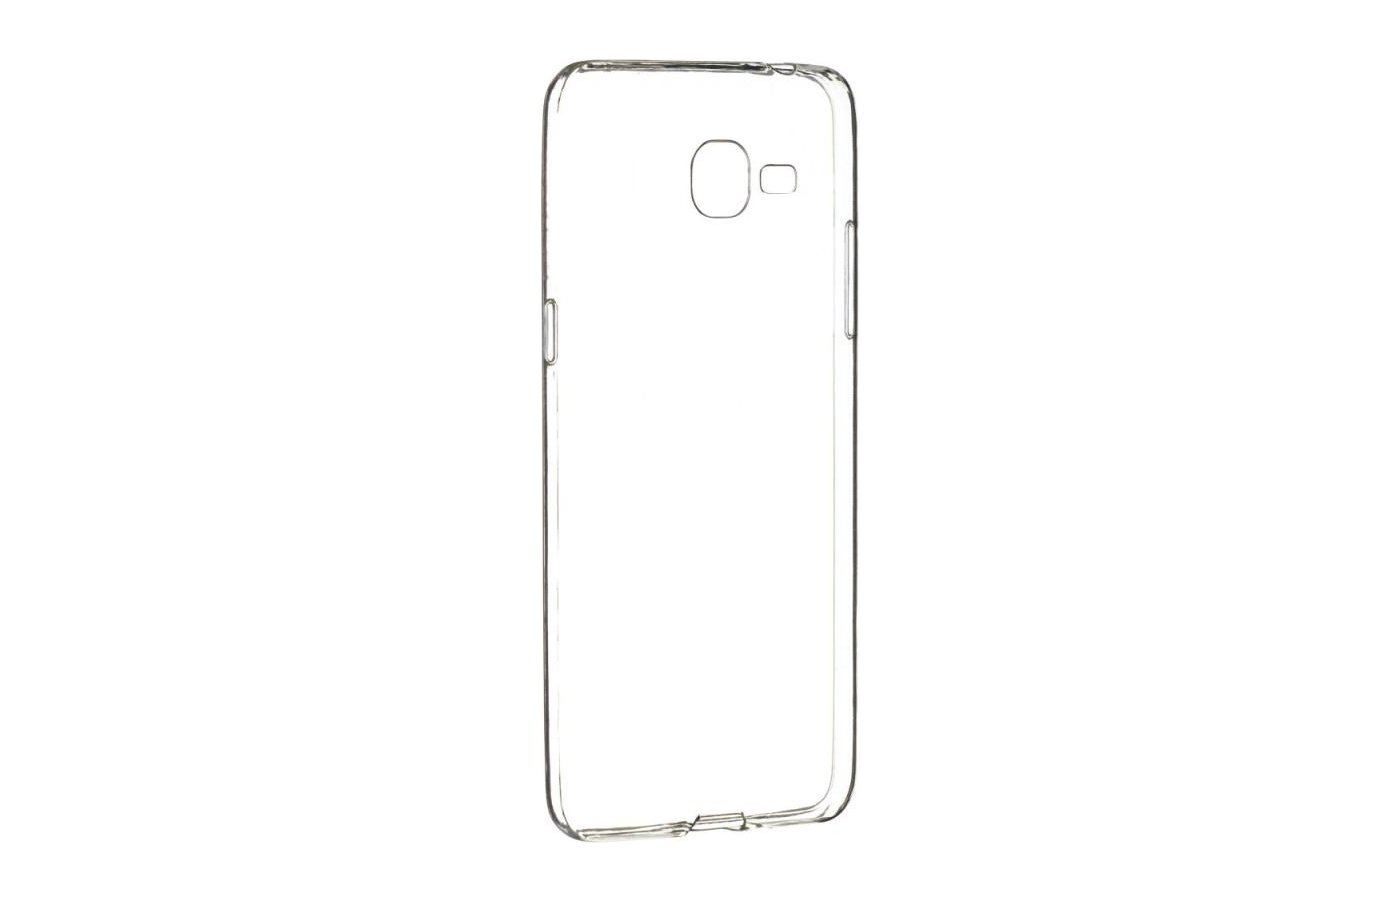 Чехол iBox Crystal для Samsung Galaxy A3 (2016) SM-A310 прозрачный